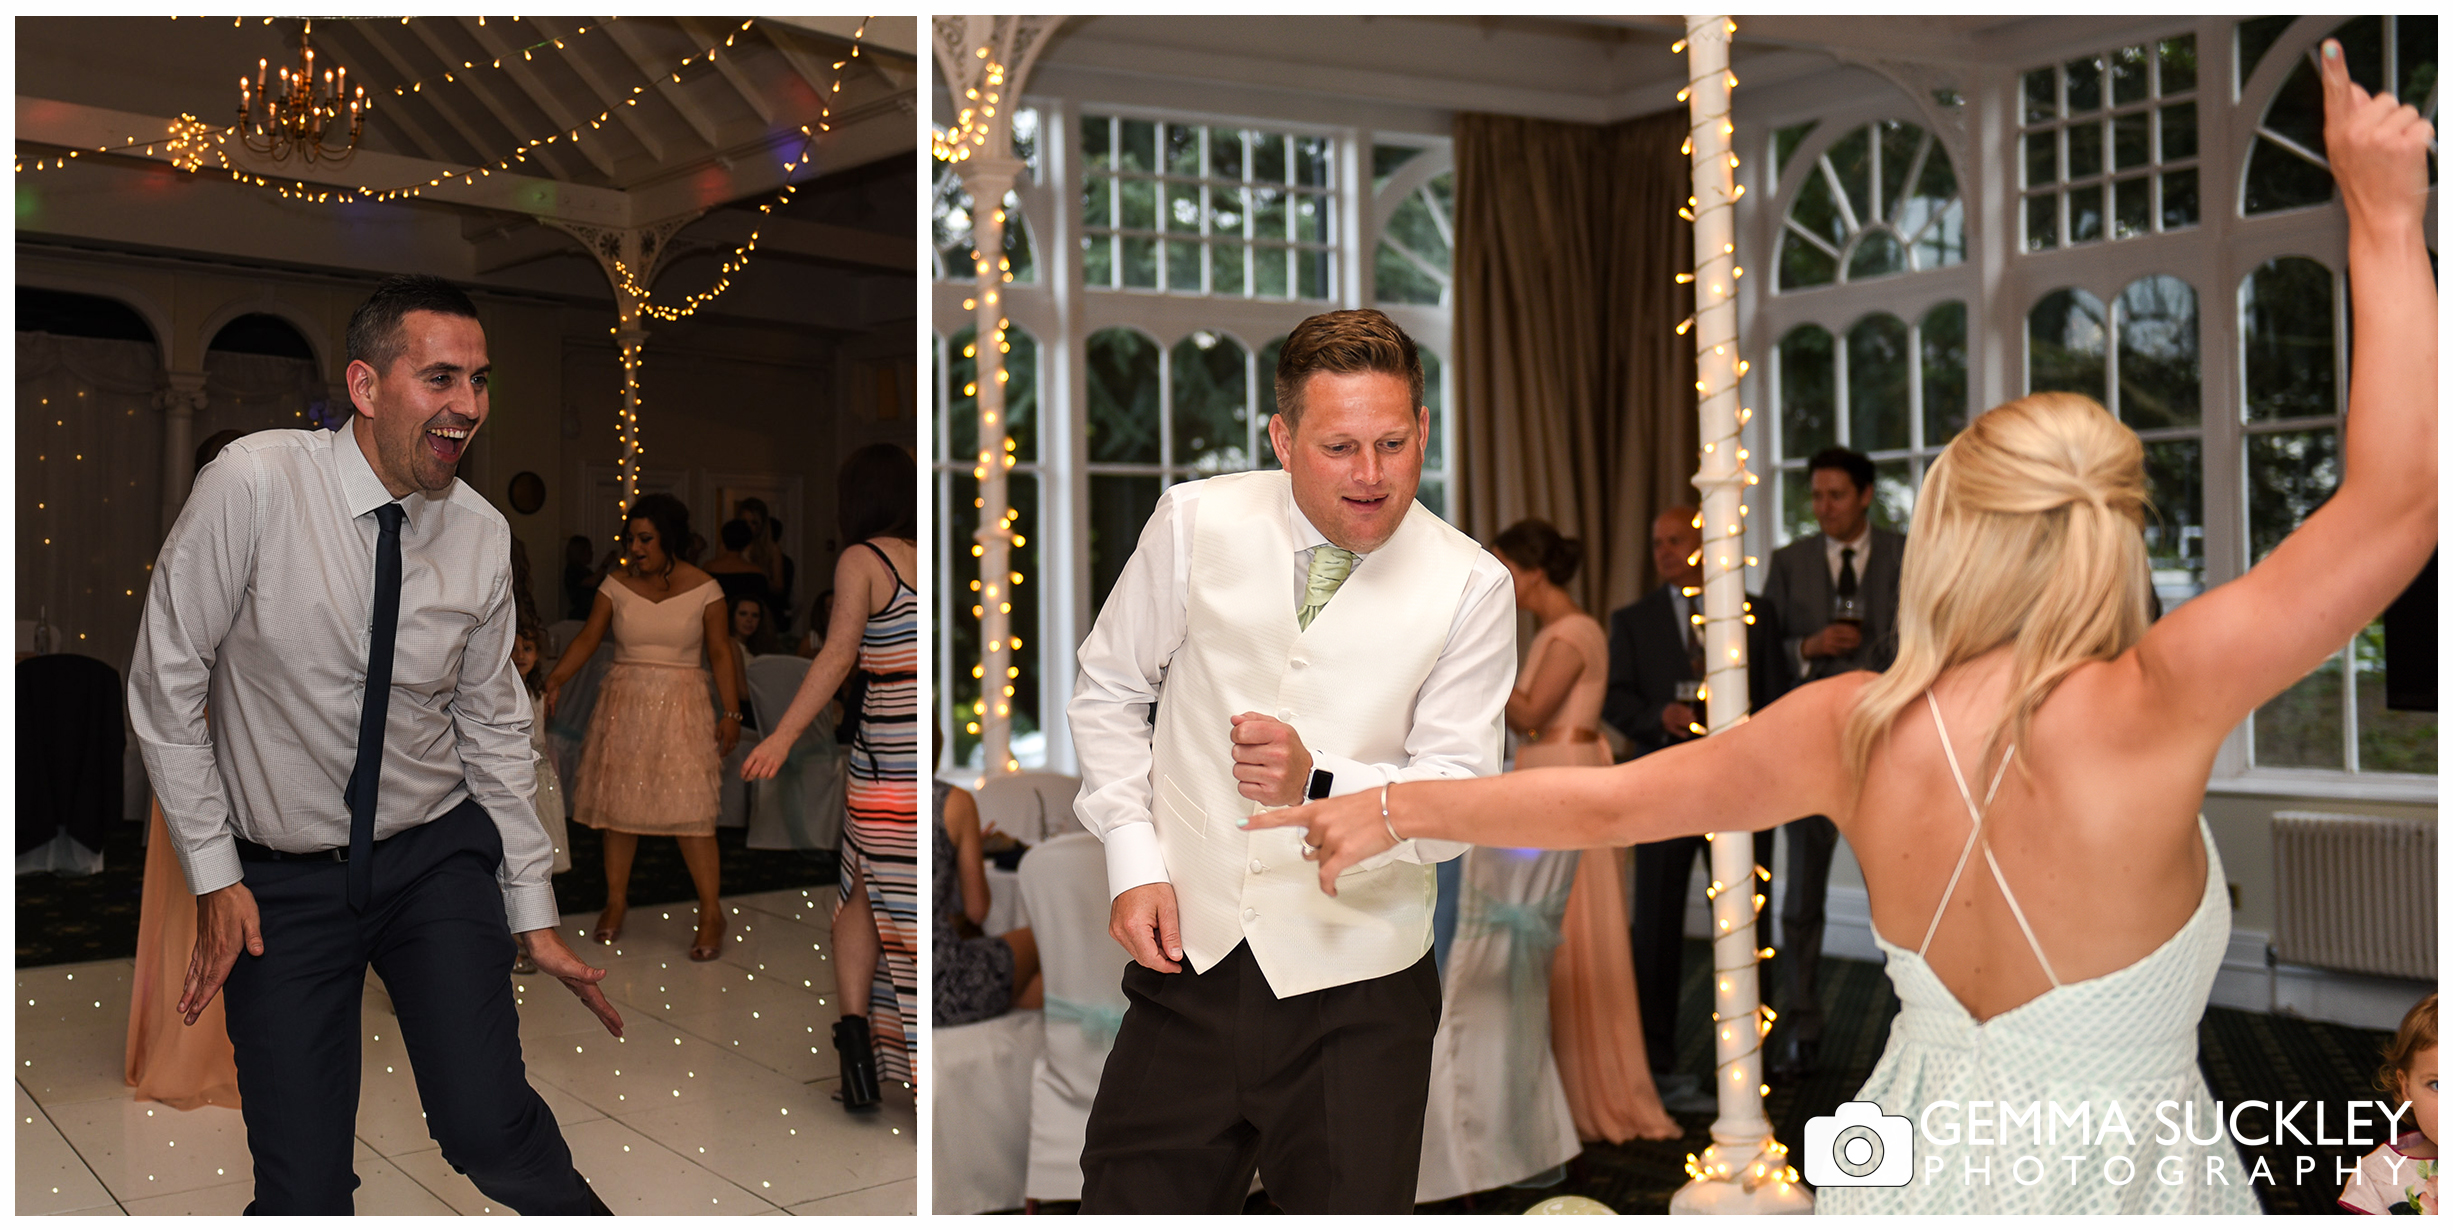 wedding-reception-harrogate©gemmasuckleyphotography-.jpg